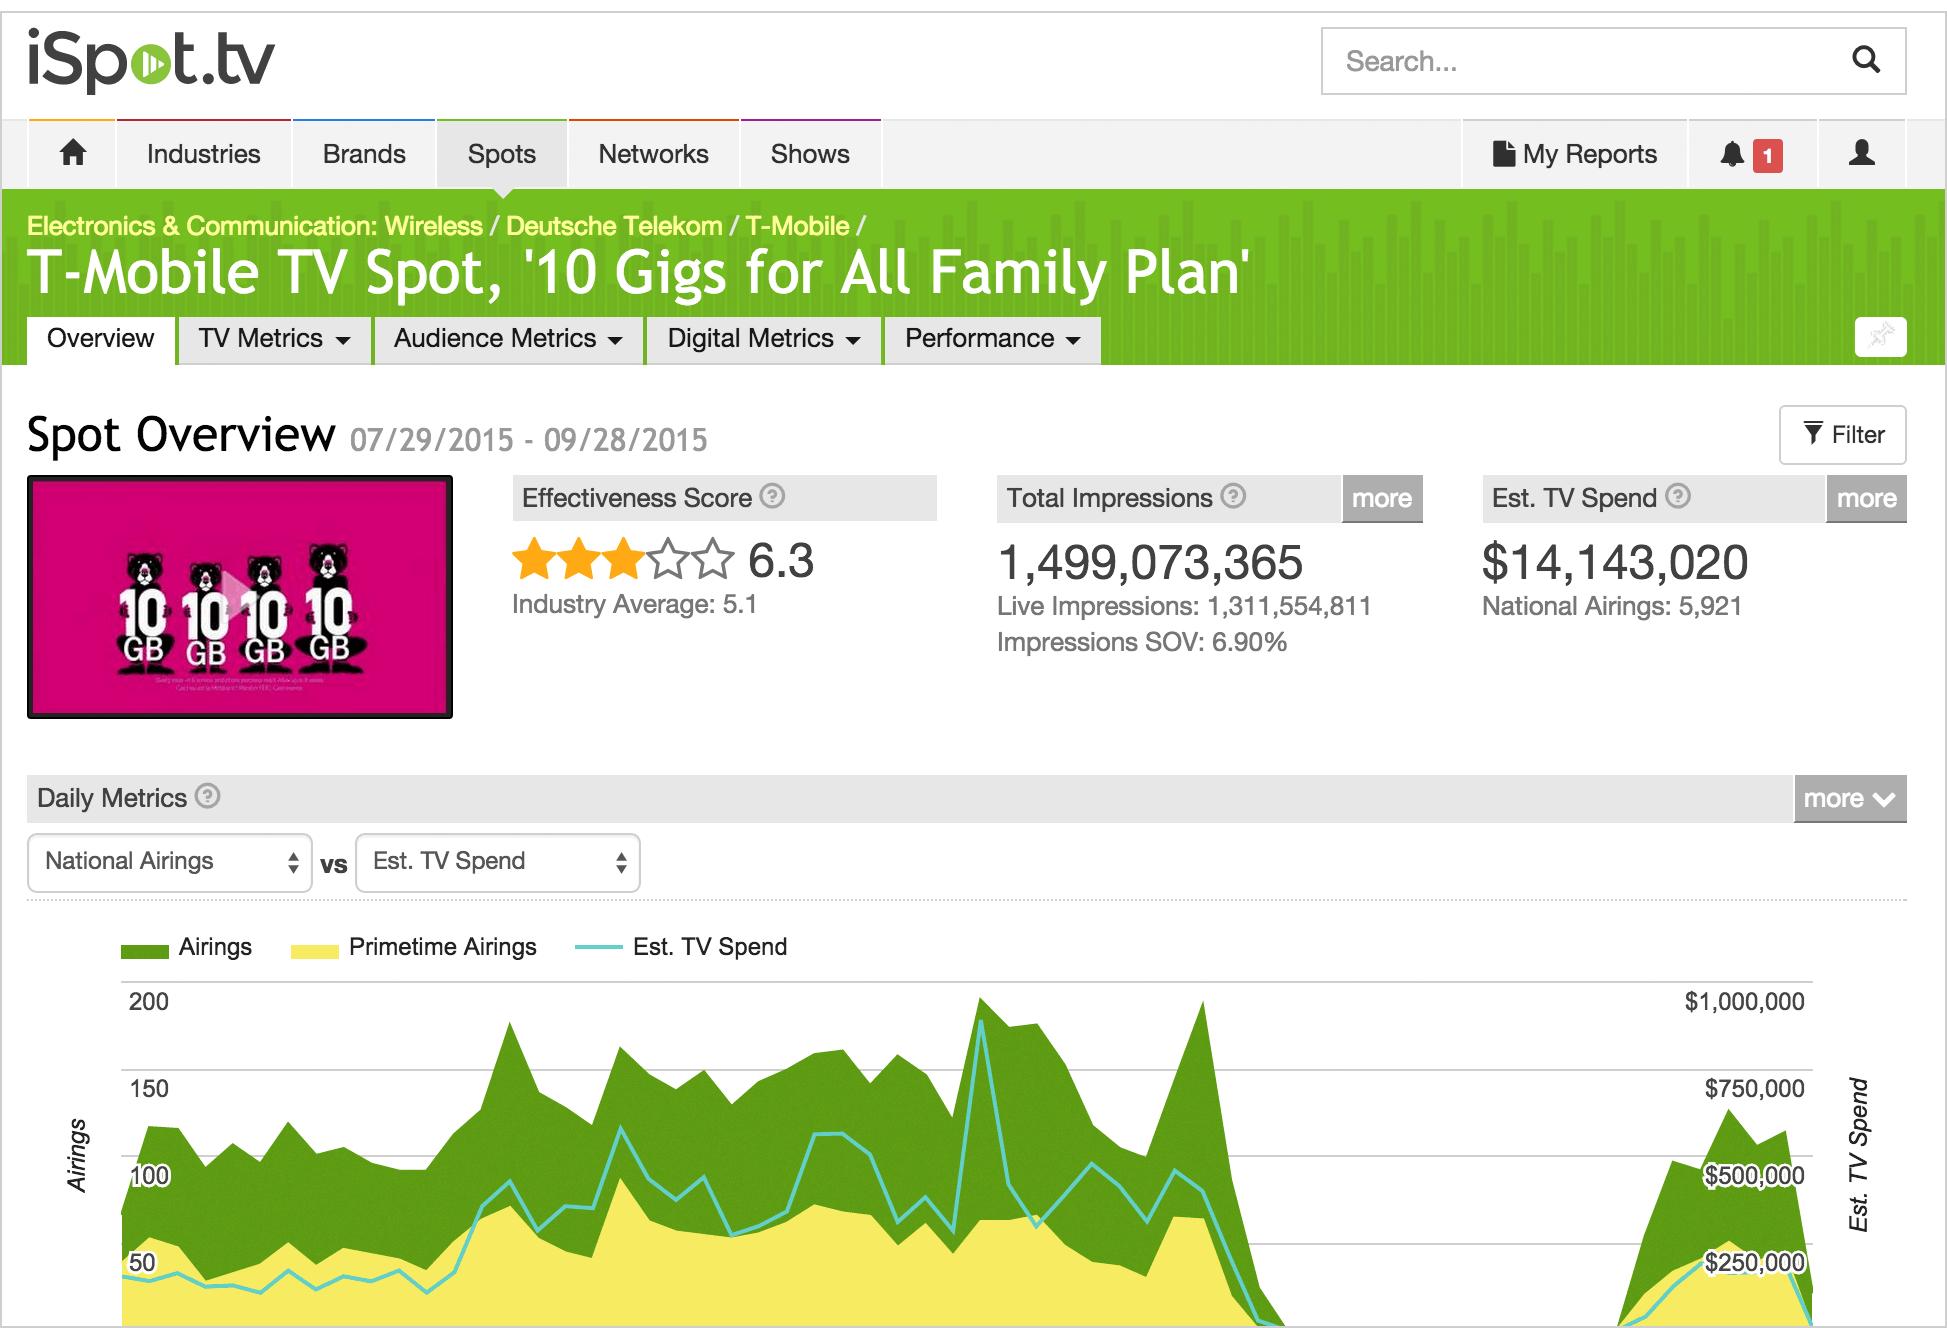 iSpot.tv | TV Metrics - Sept 29 Release